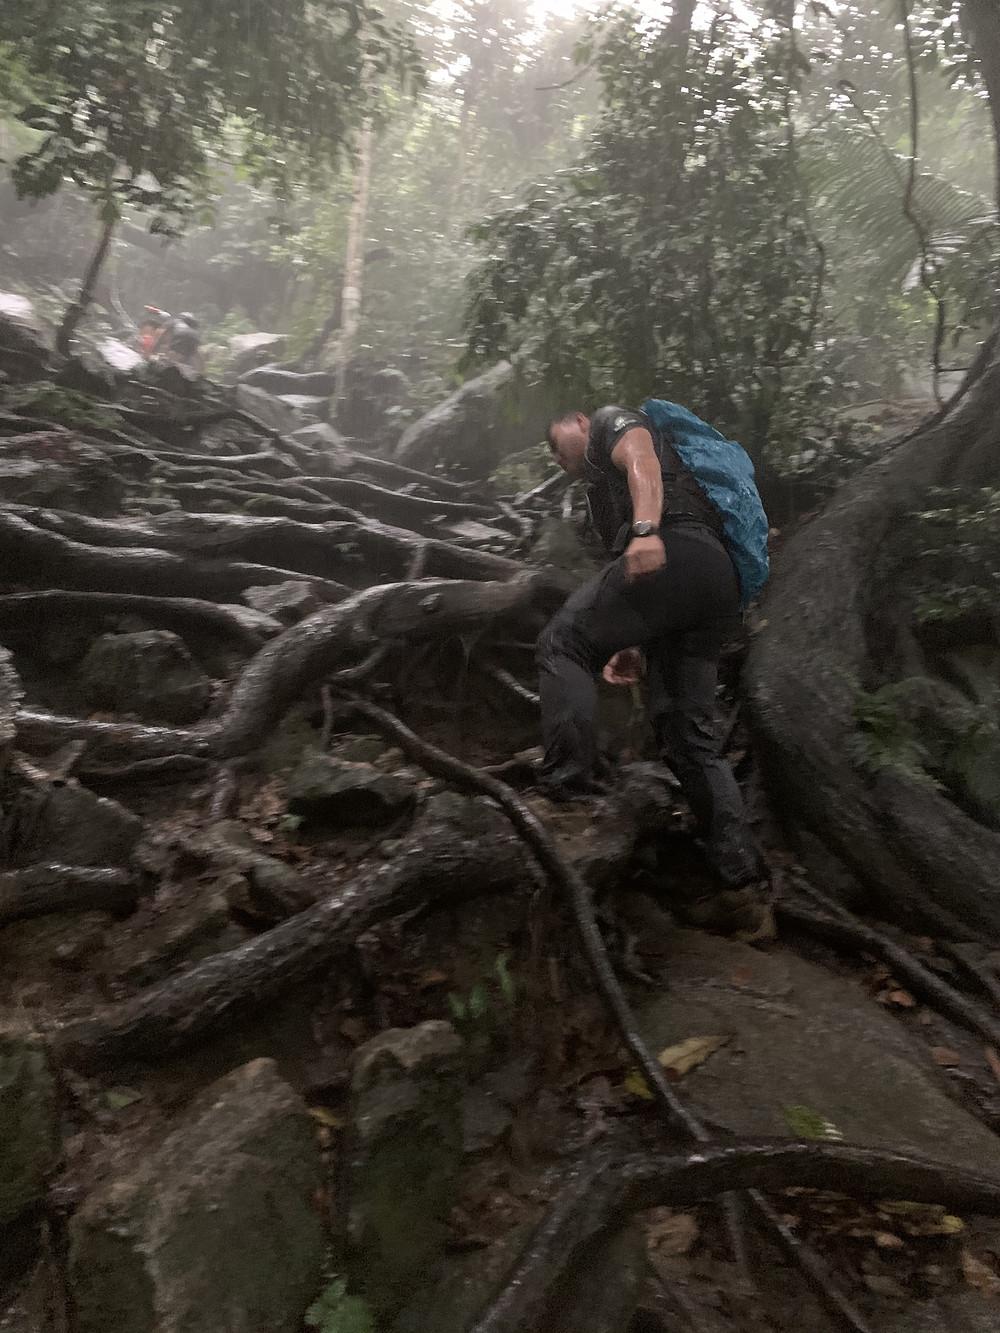 gunung datuk, malaysia hikes, gunung datuk rembau